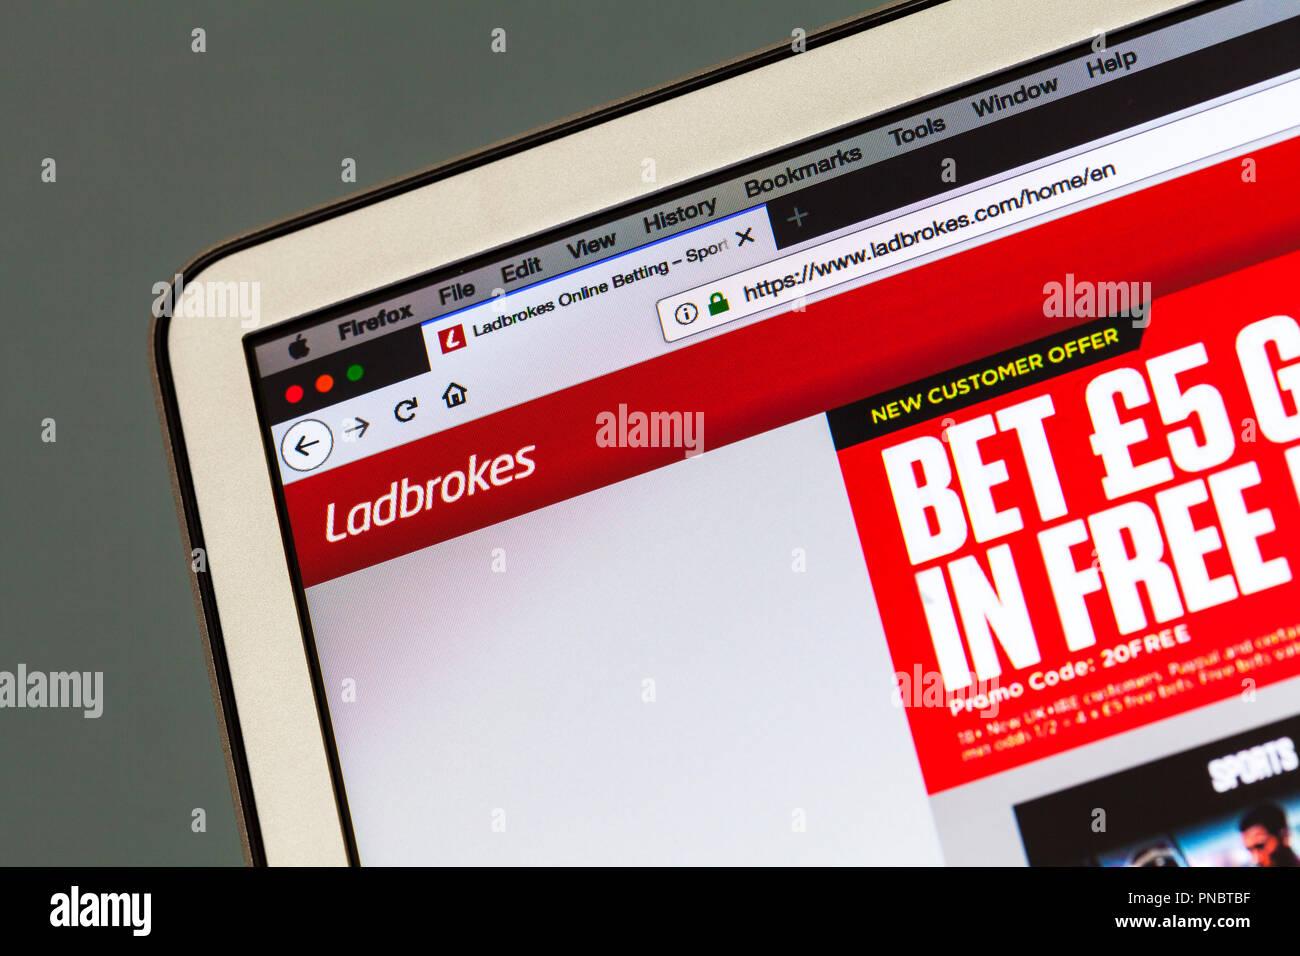 Online betting ladbrokes bookmaker betting sports online usa